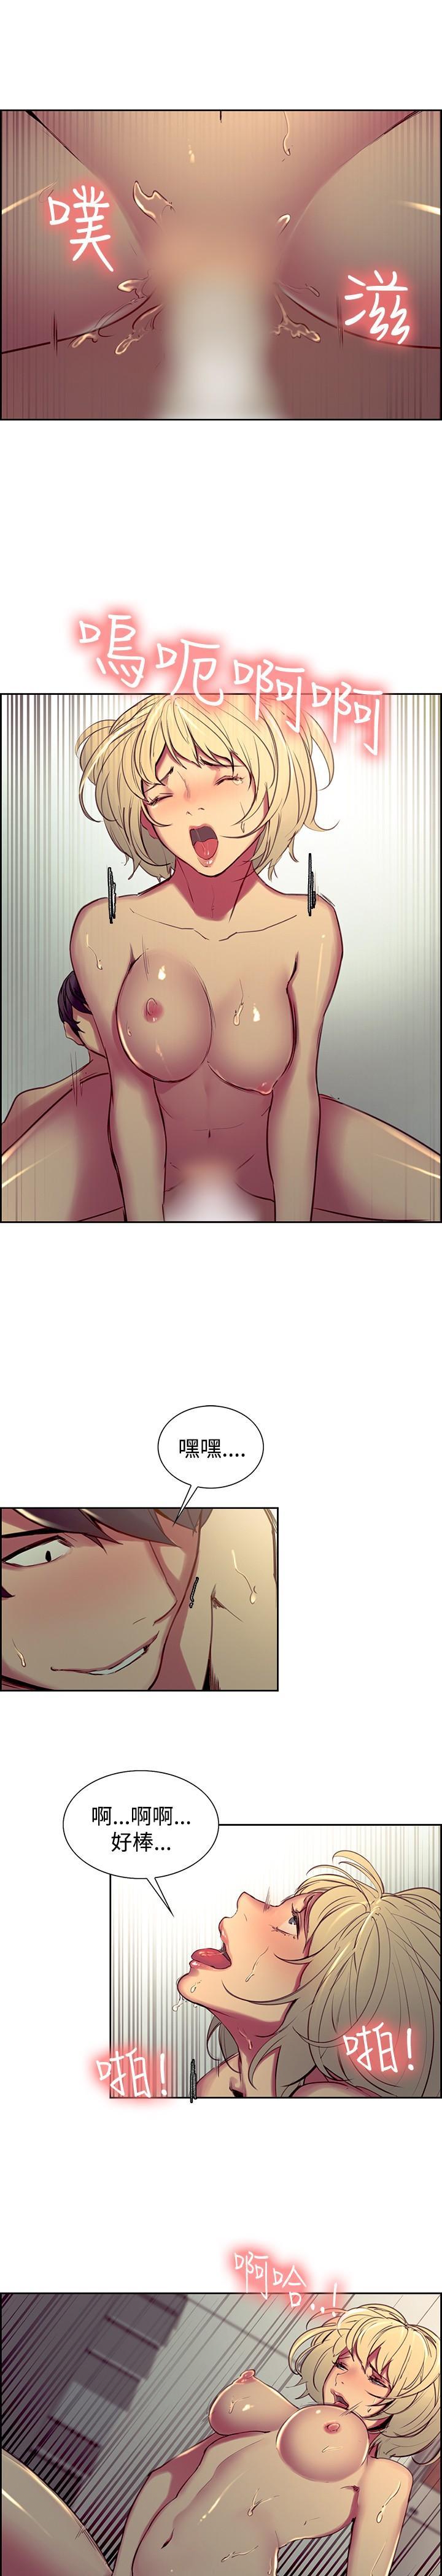 Domesticate the Housekeeper 调教家政妇 ch.29-30 14